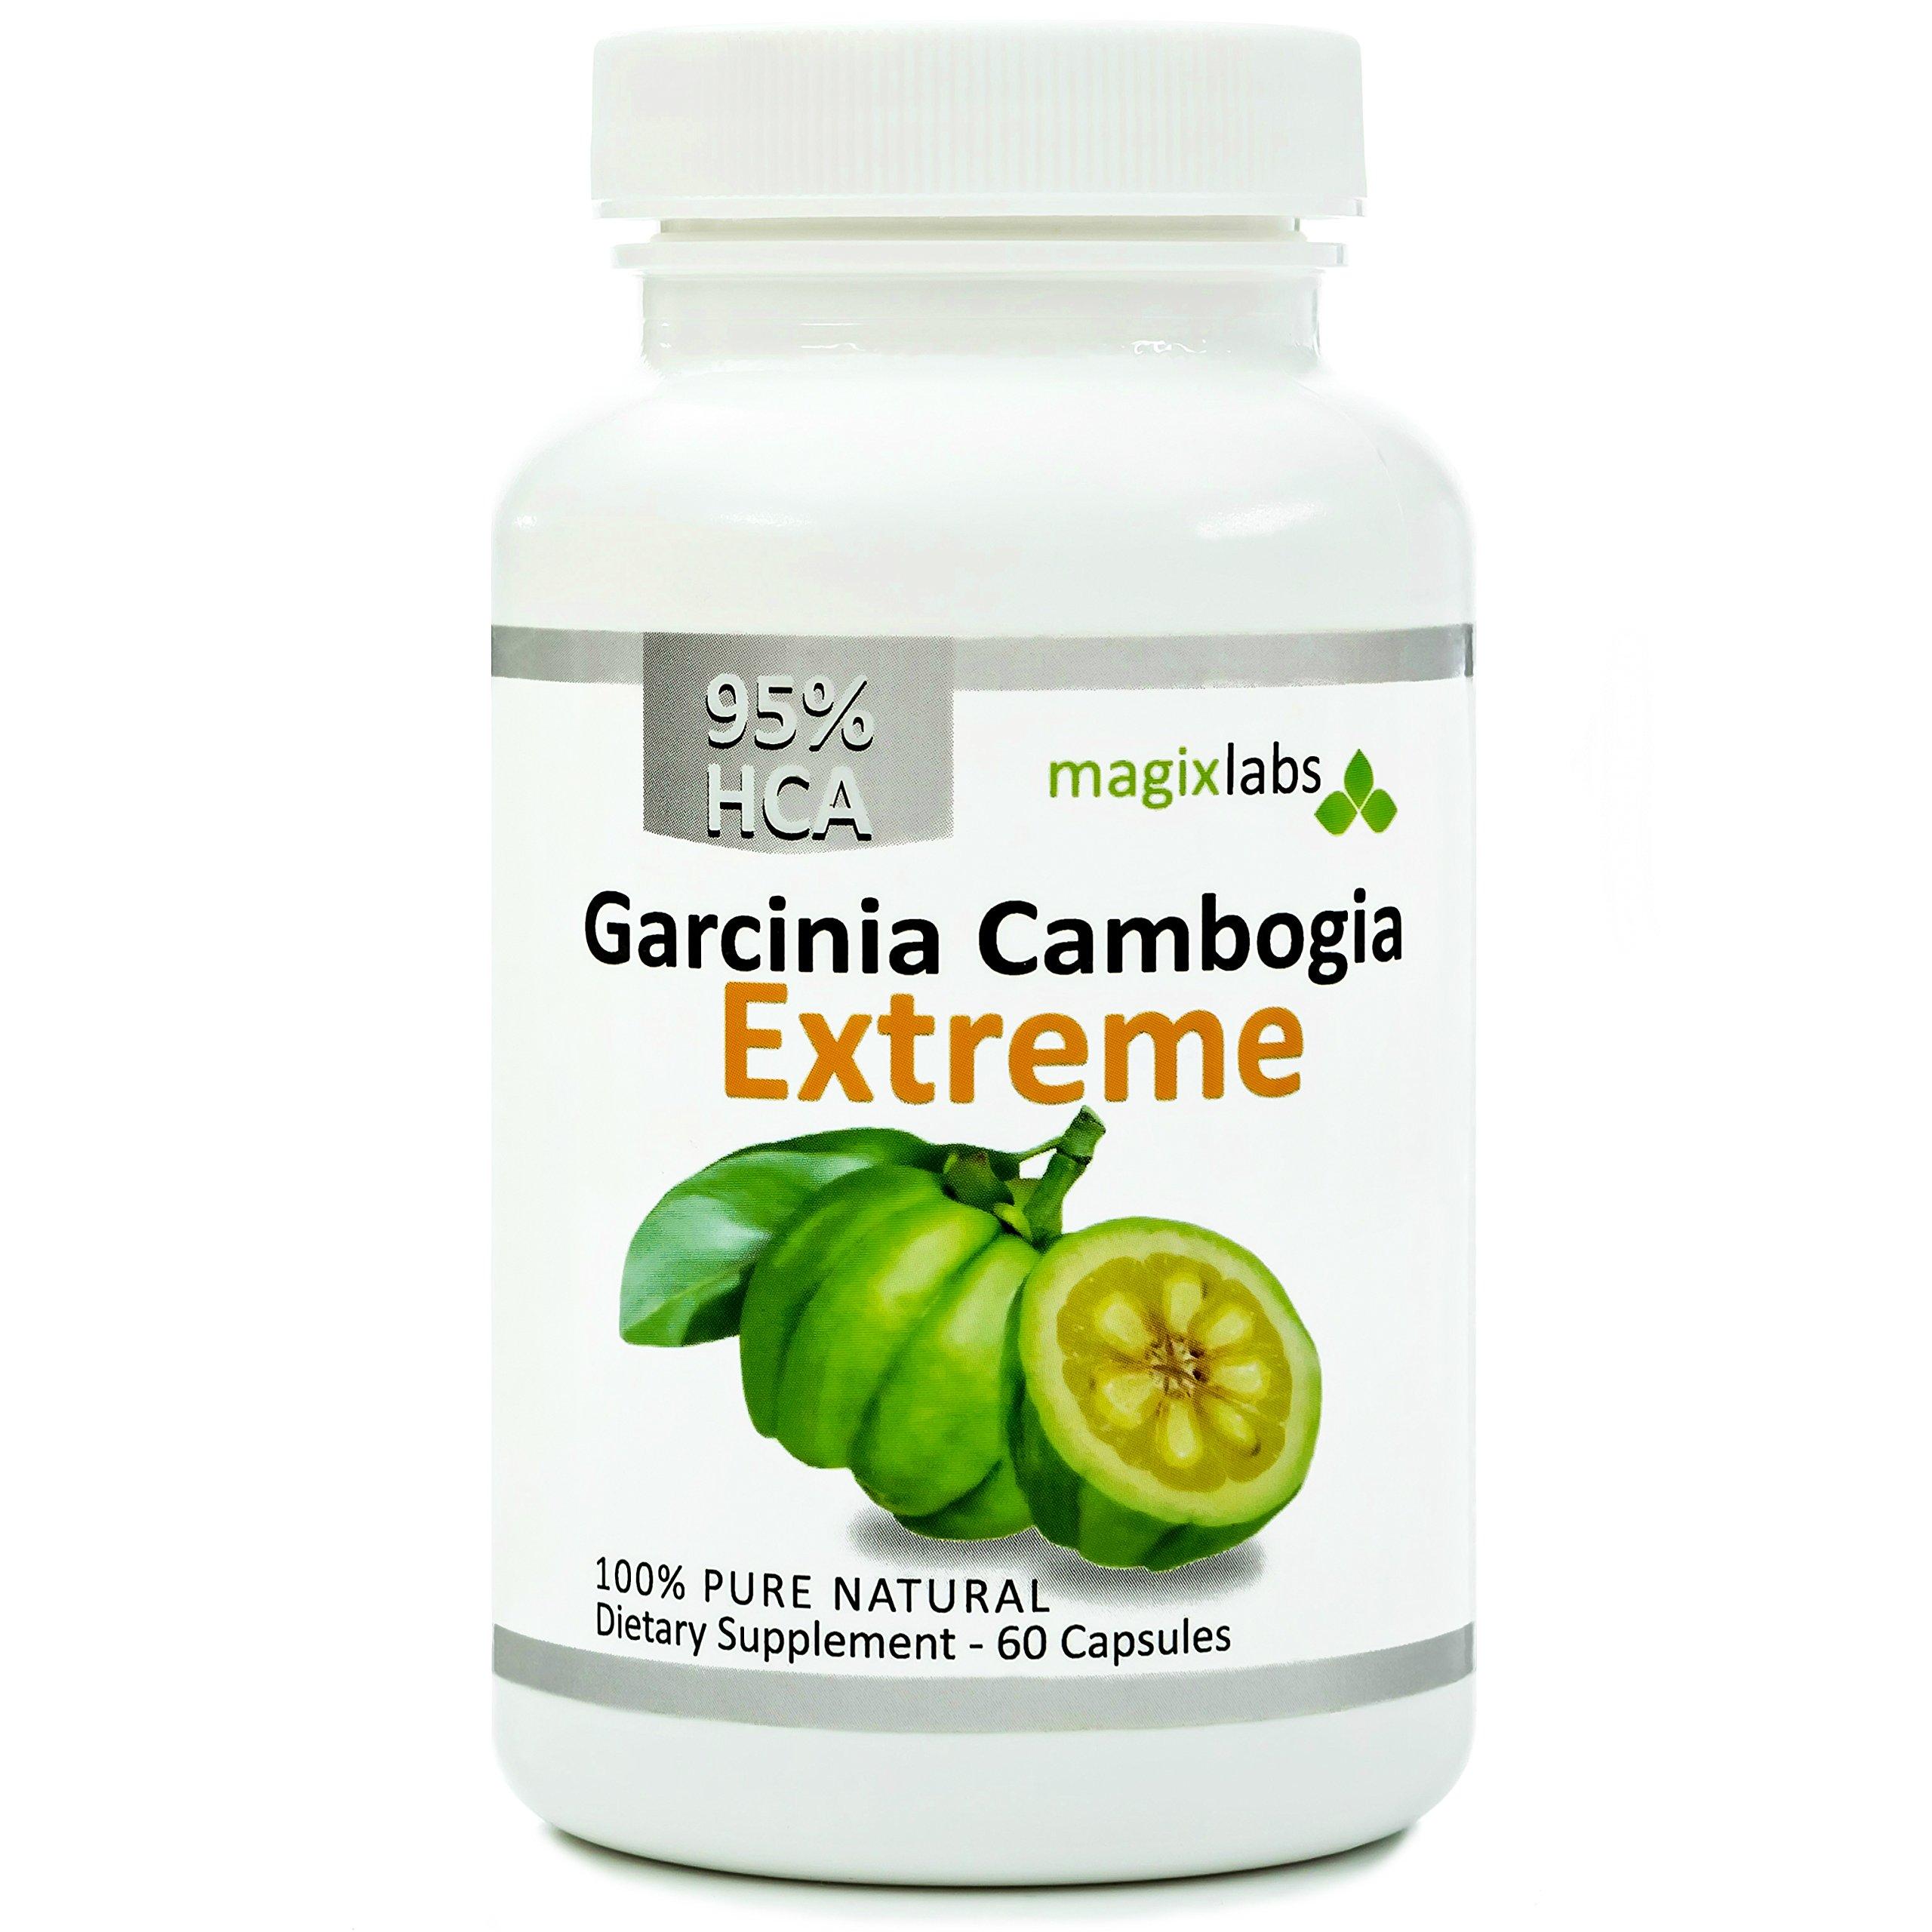 95% HCA Garcinia Cambogia EXTREME